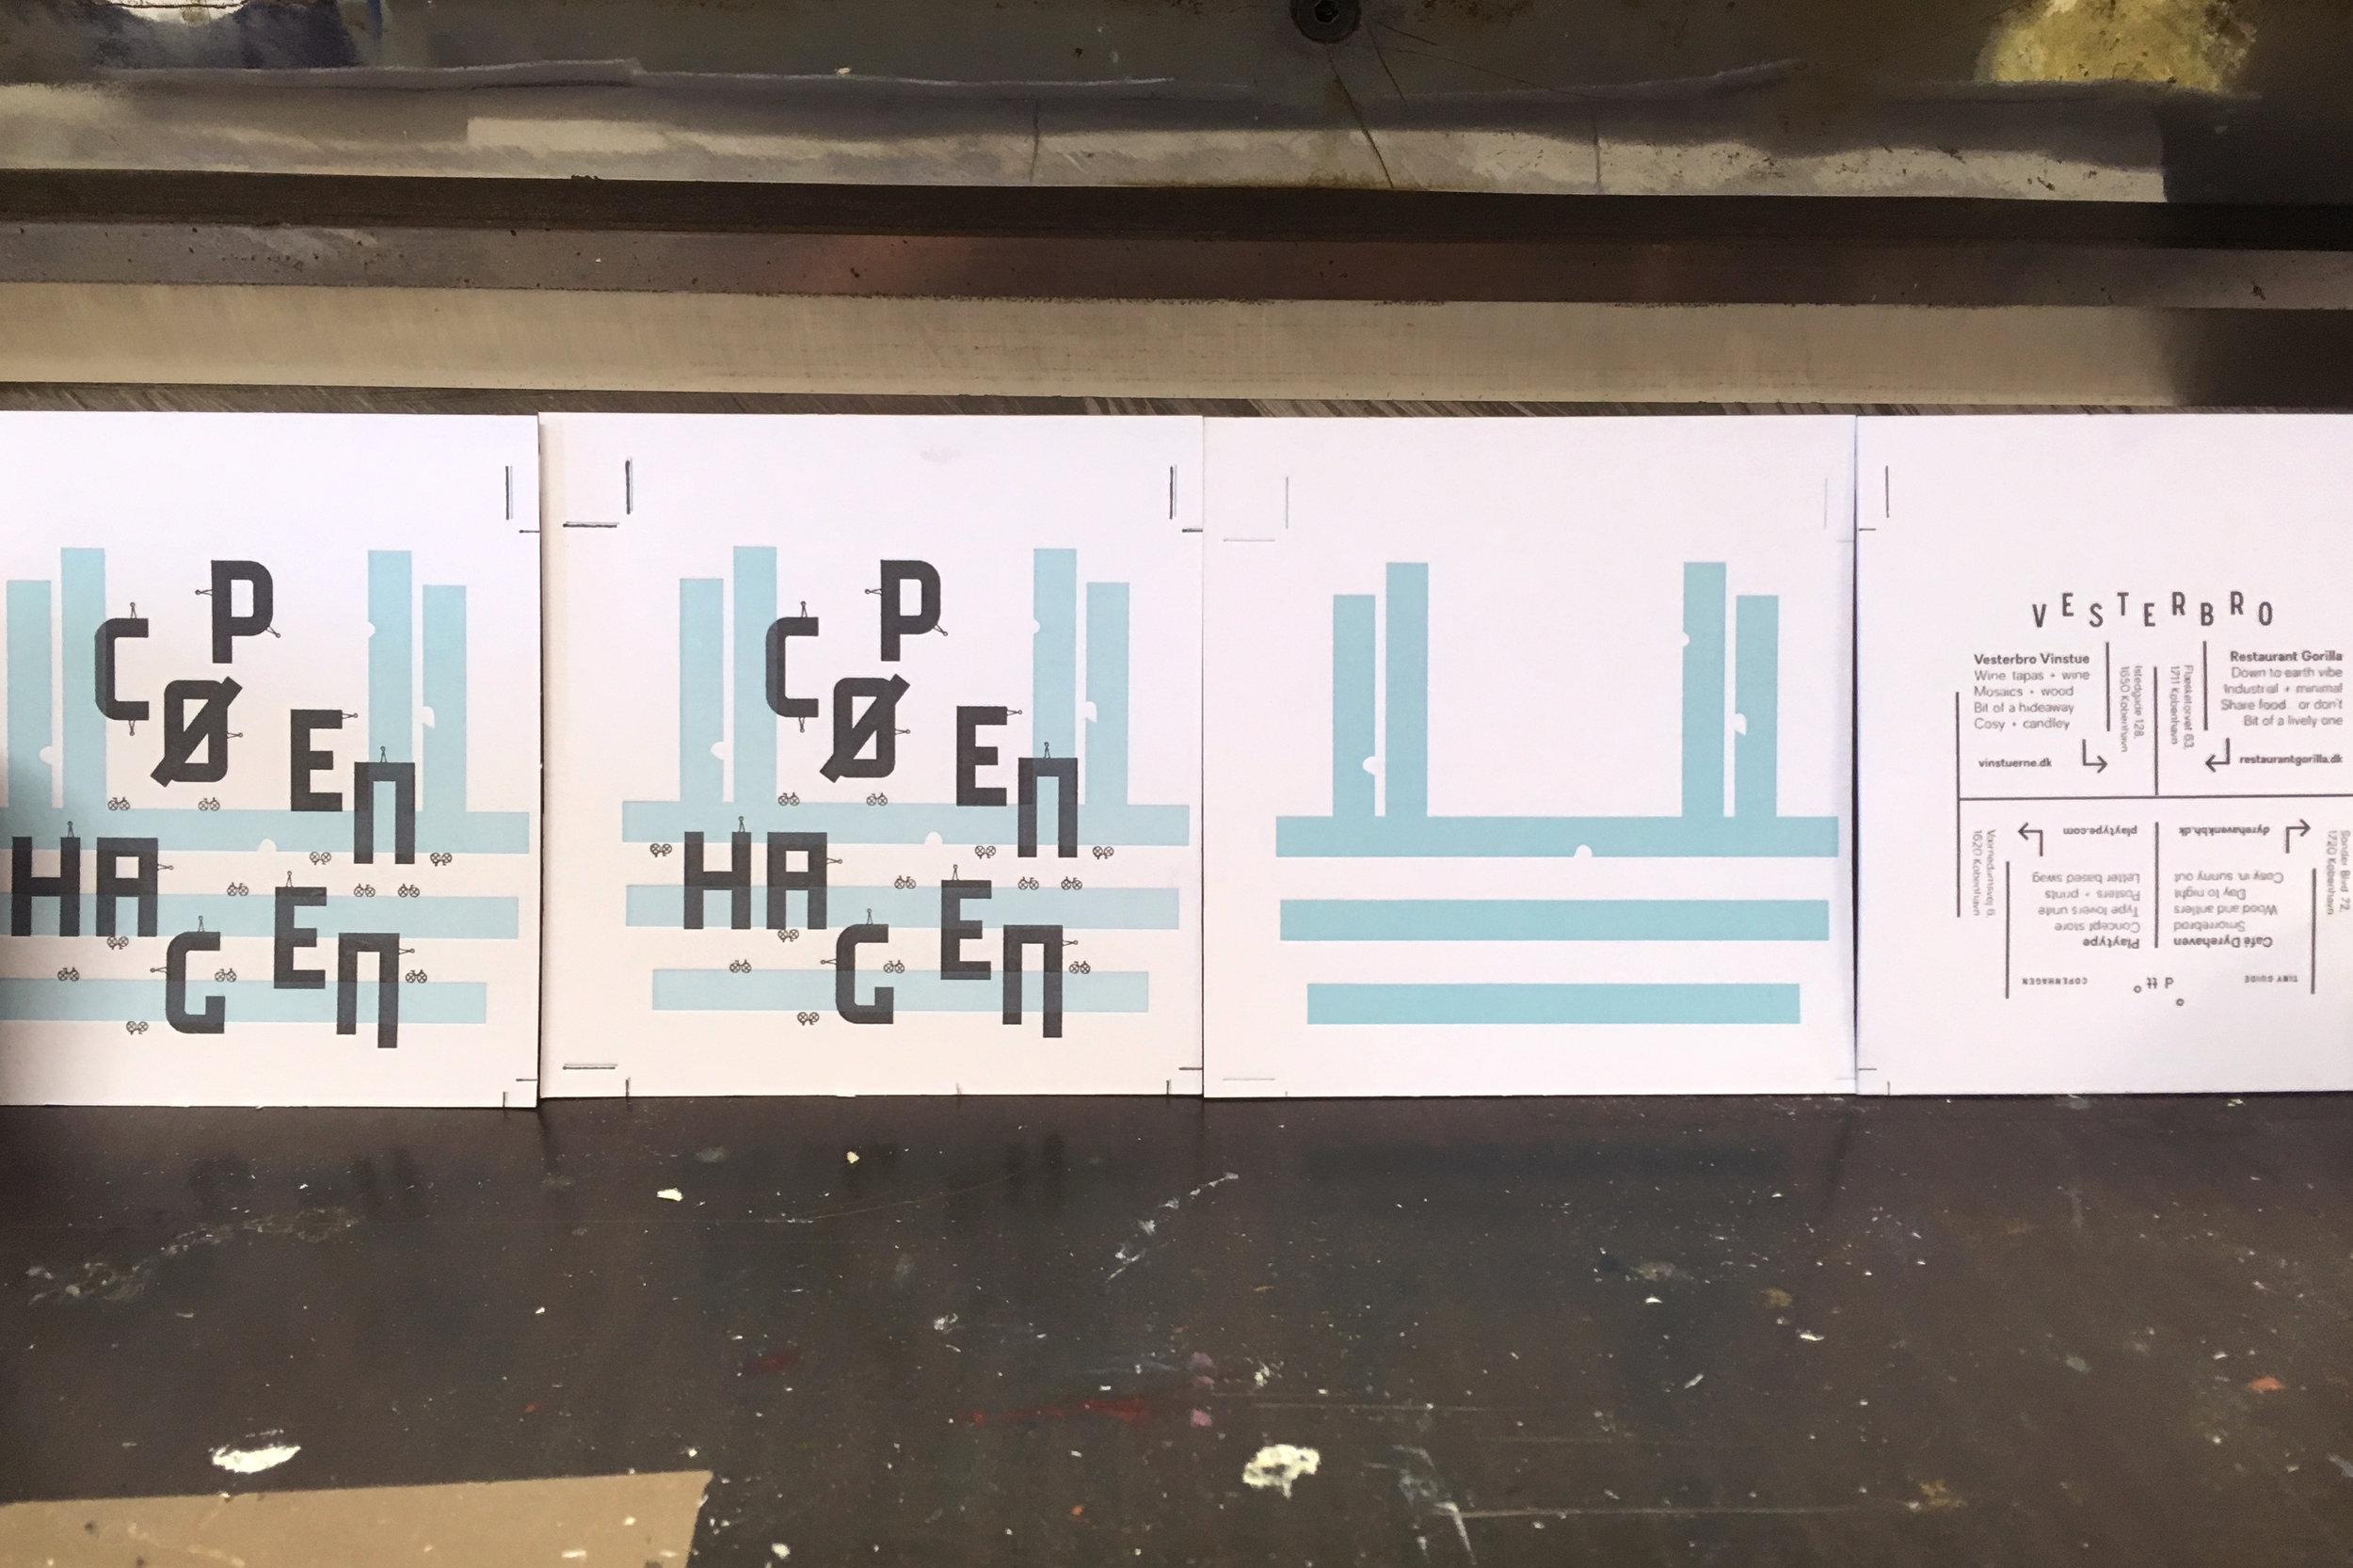 Copenhagen on press, 2 plates done